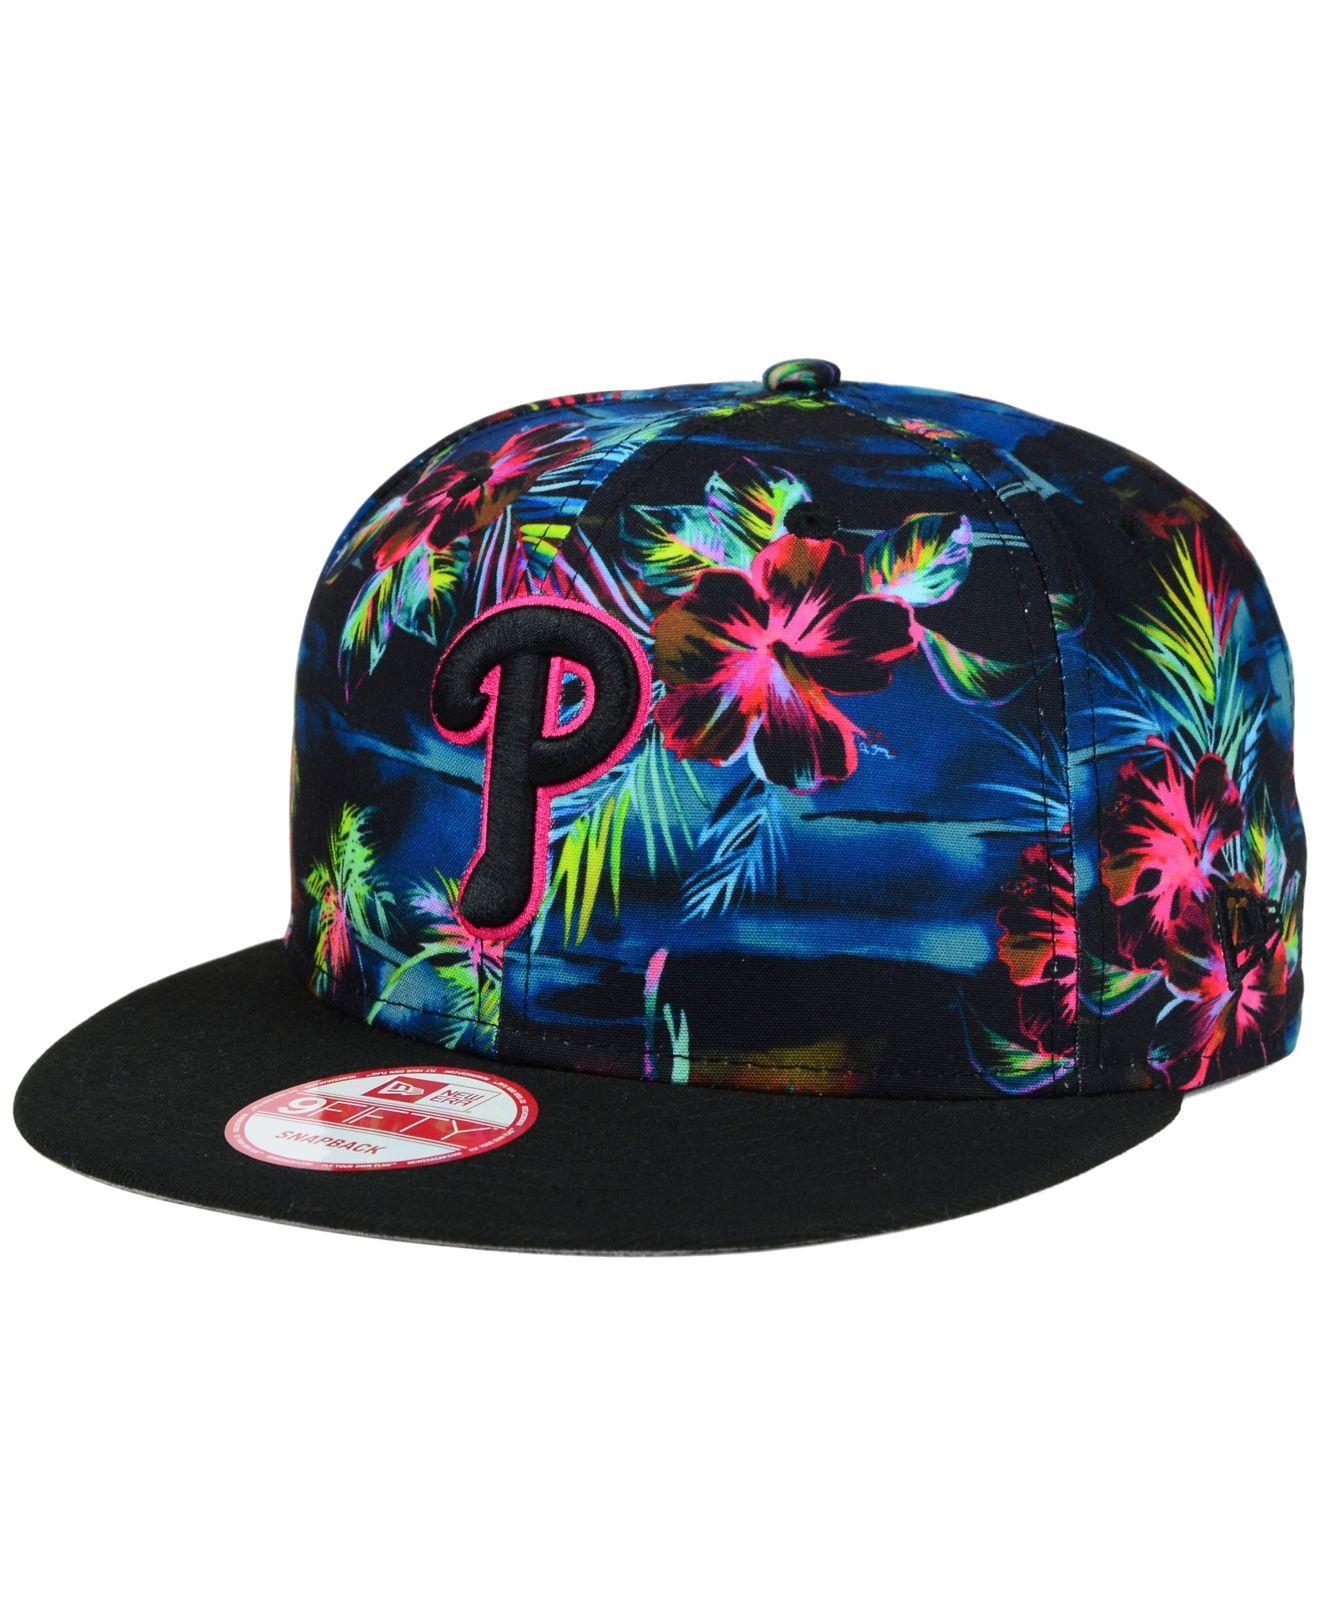 b5a5ba7cbe0 Lyst - KTZ Philadelphia Phillies Dark Tropic 9fifty Snapback Cap in ...